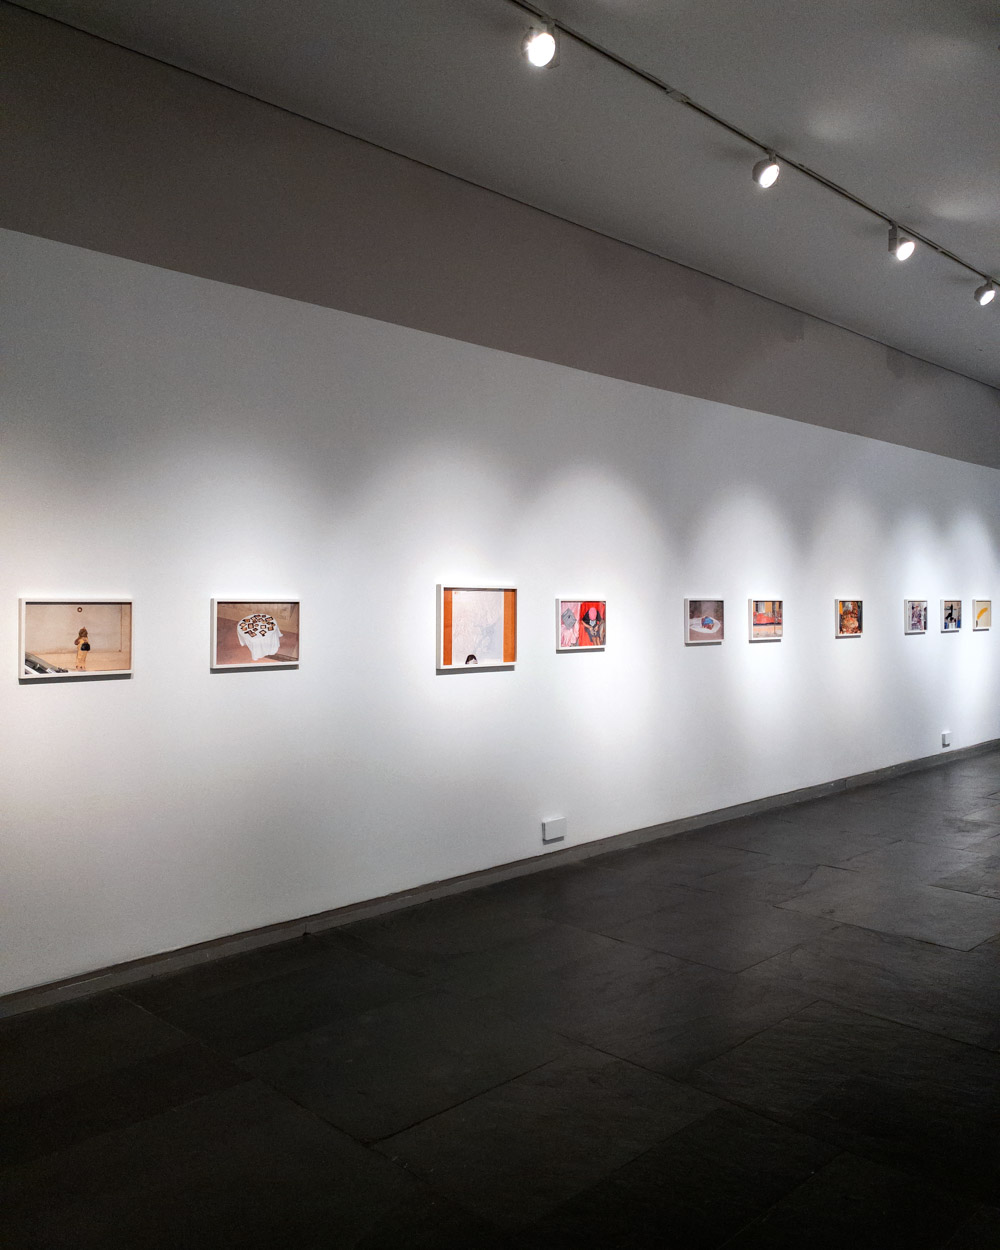 'Educandos de Benejúzar'. Carlos Aguilera. MuVIM. Fragments. Estudio Paco Mora.